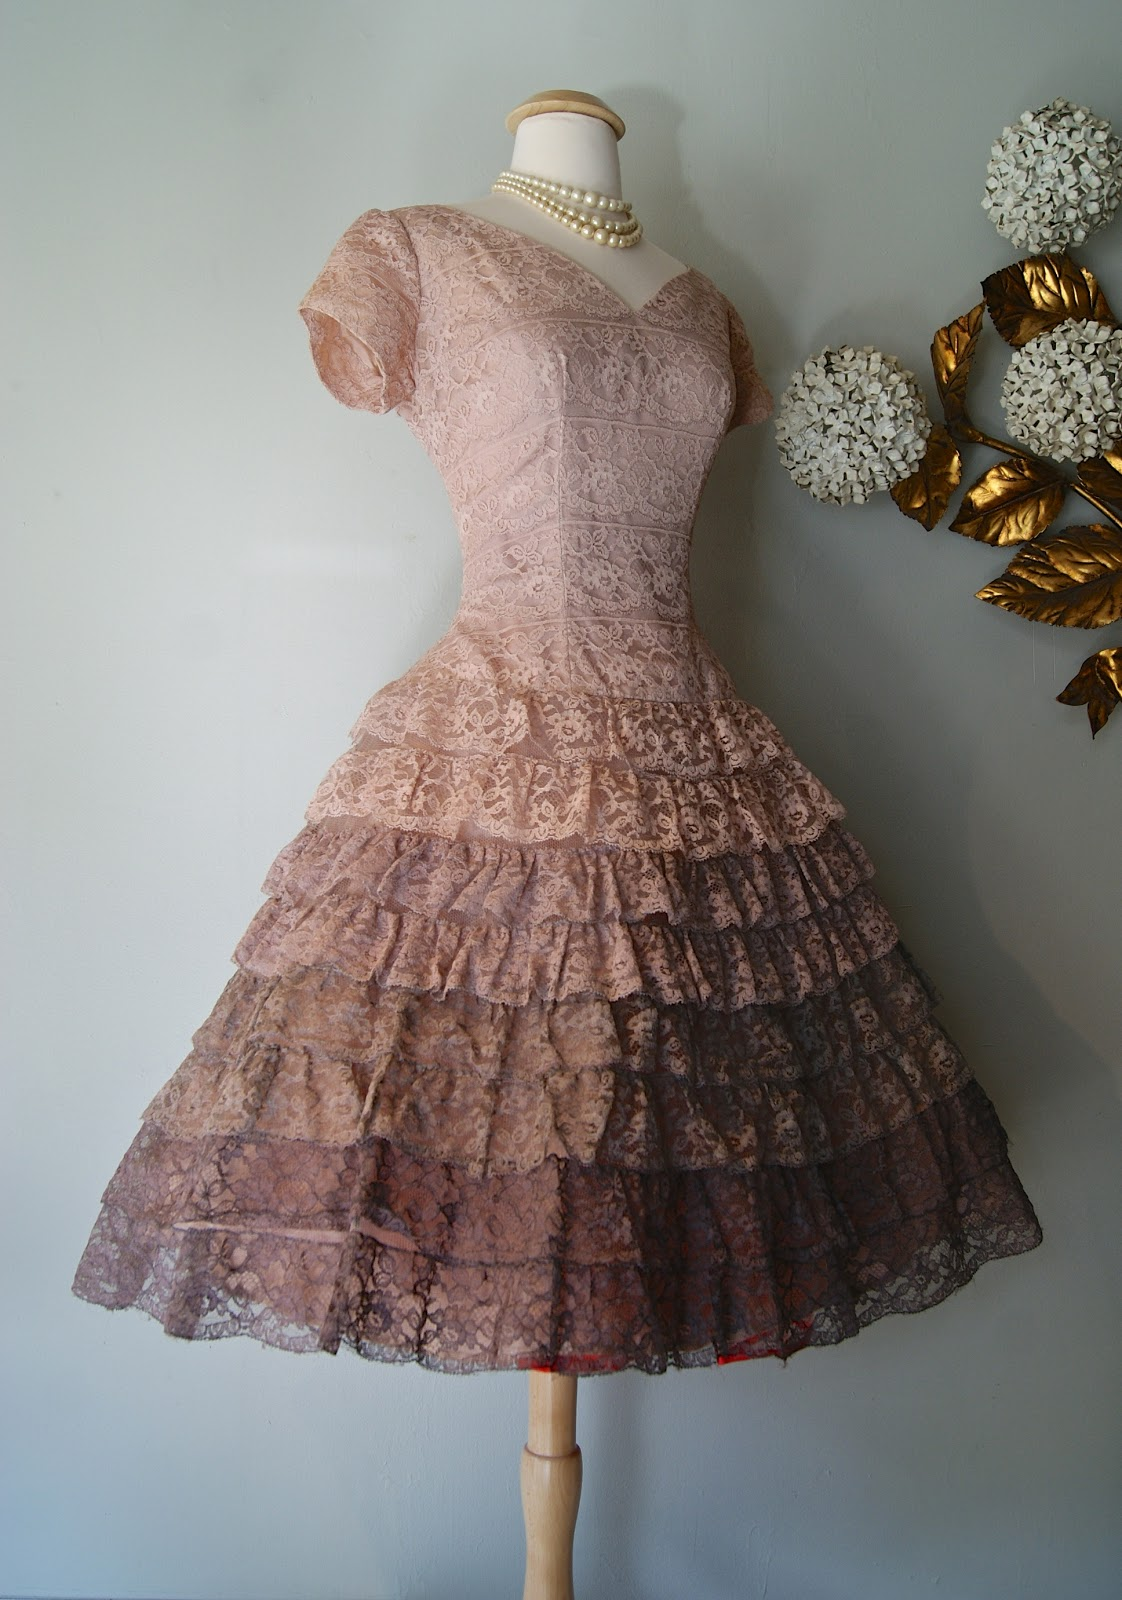 9bfb74ad591 Xtabay Vintage Clothing Boutique - Portland